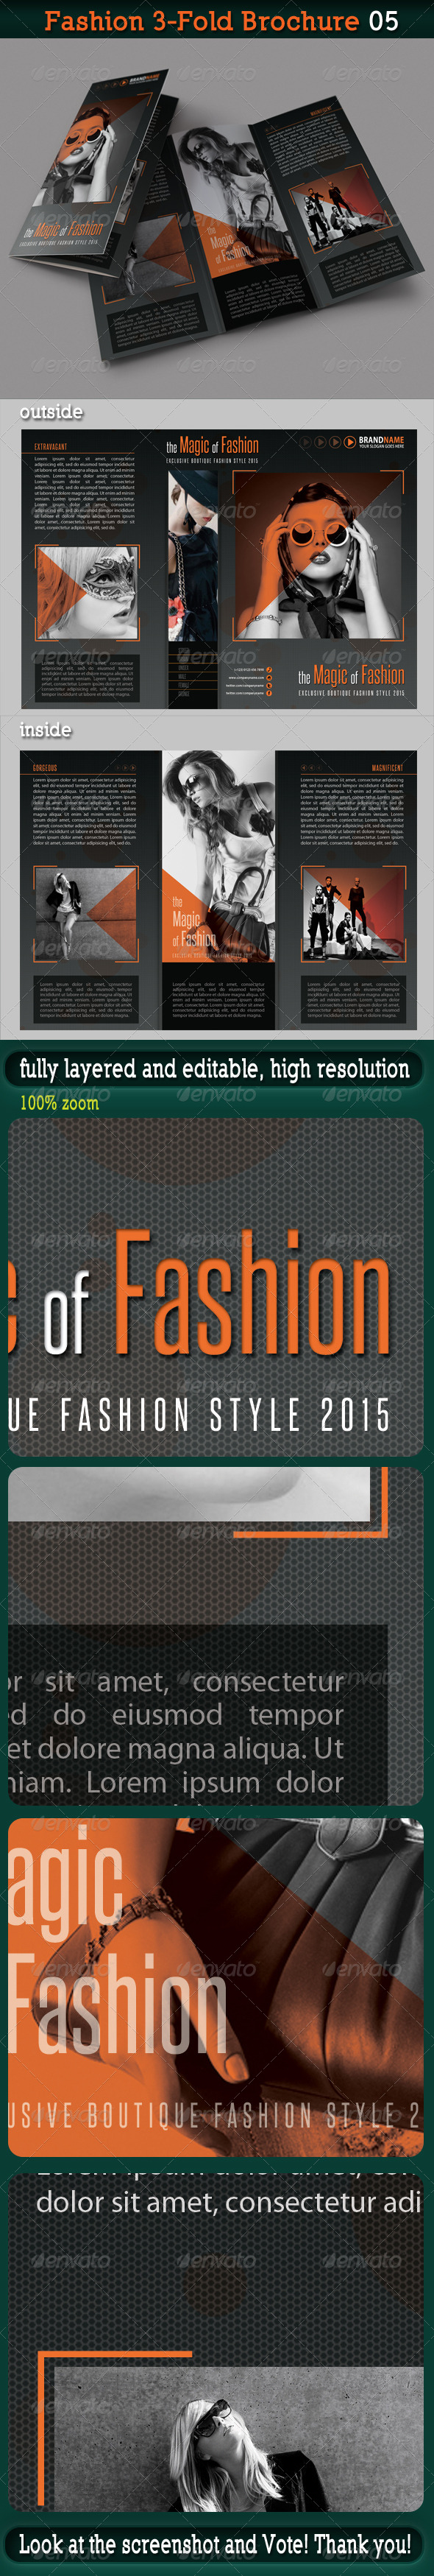 Fashion 3-Fold Brochure 05 - Catalogs Brochures